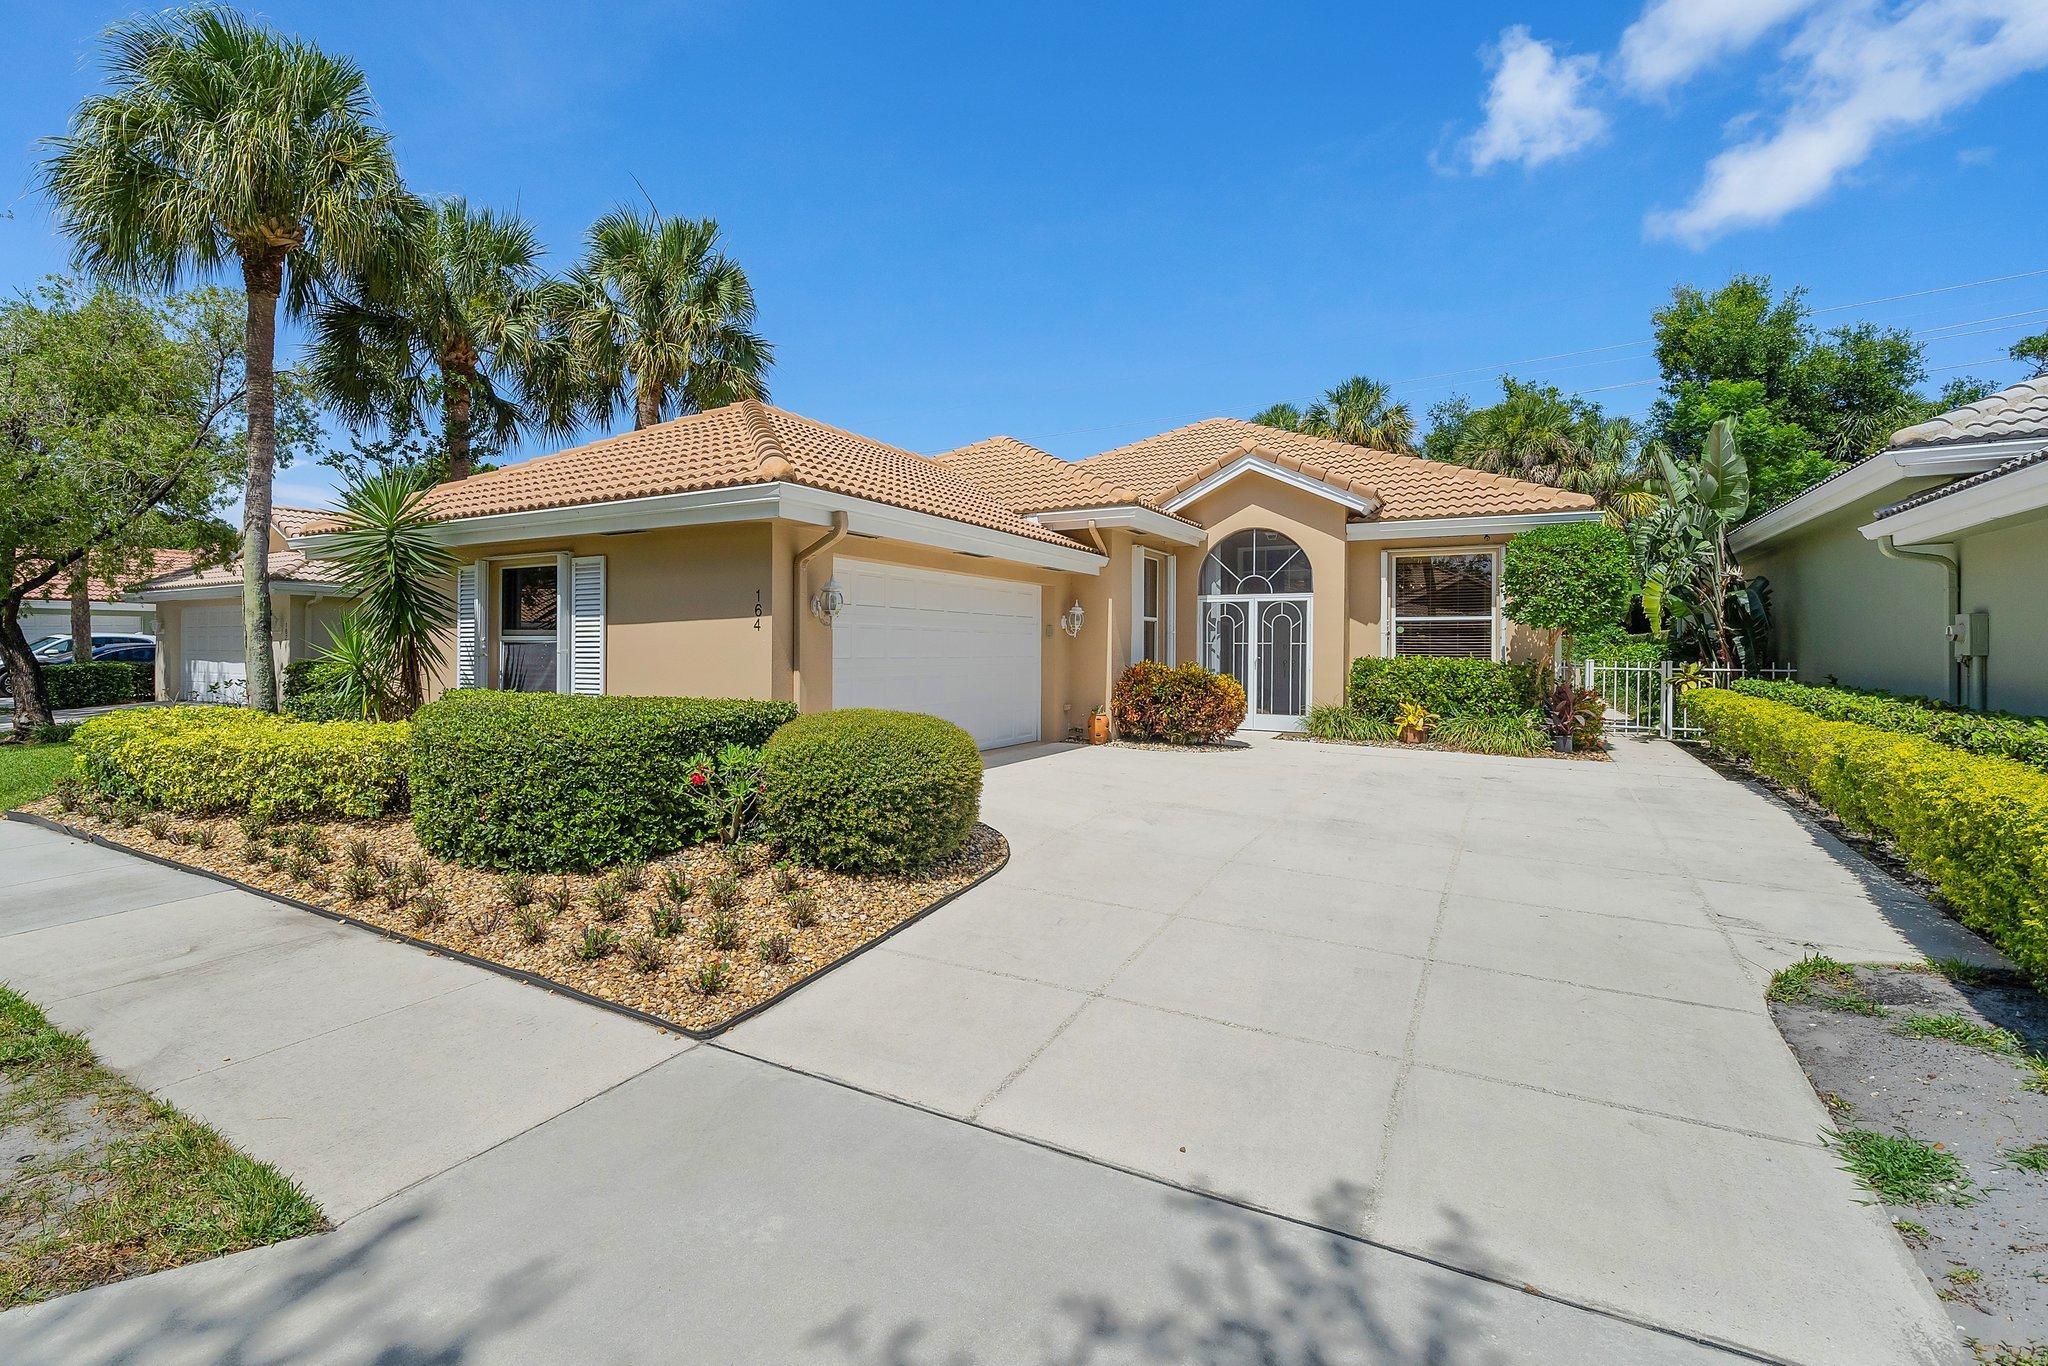 164 E Hampton Way  For Sale 10732214, FL